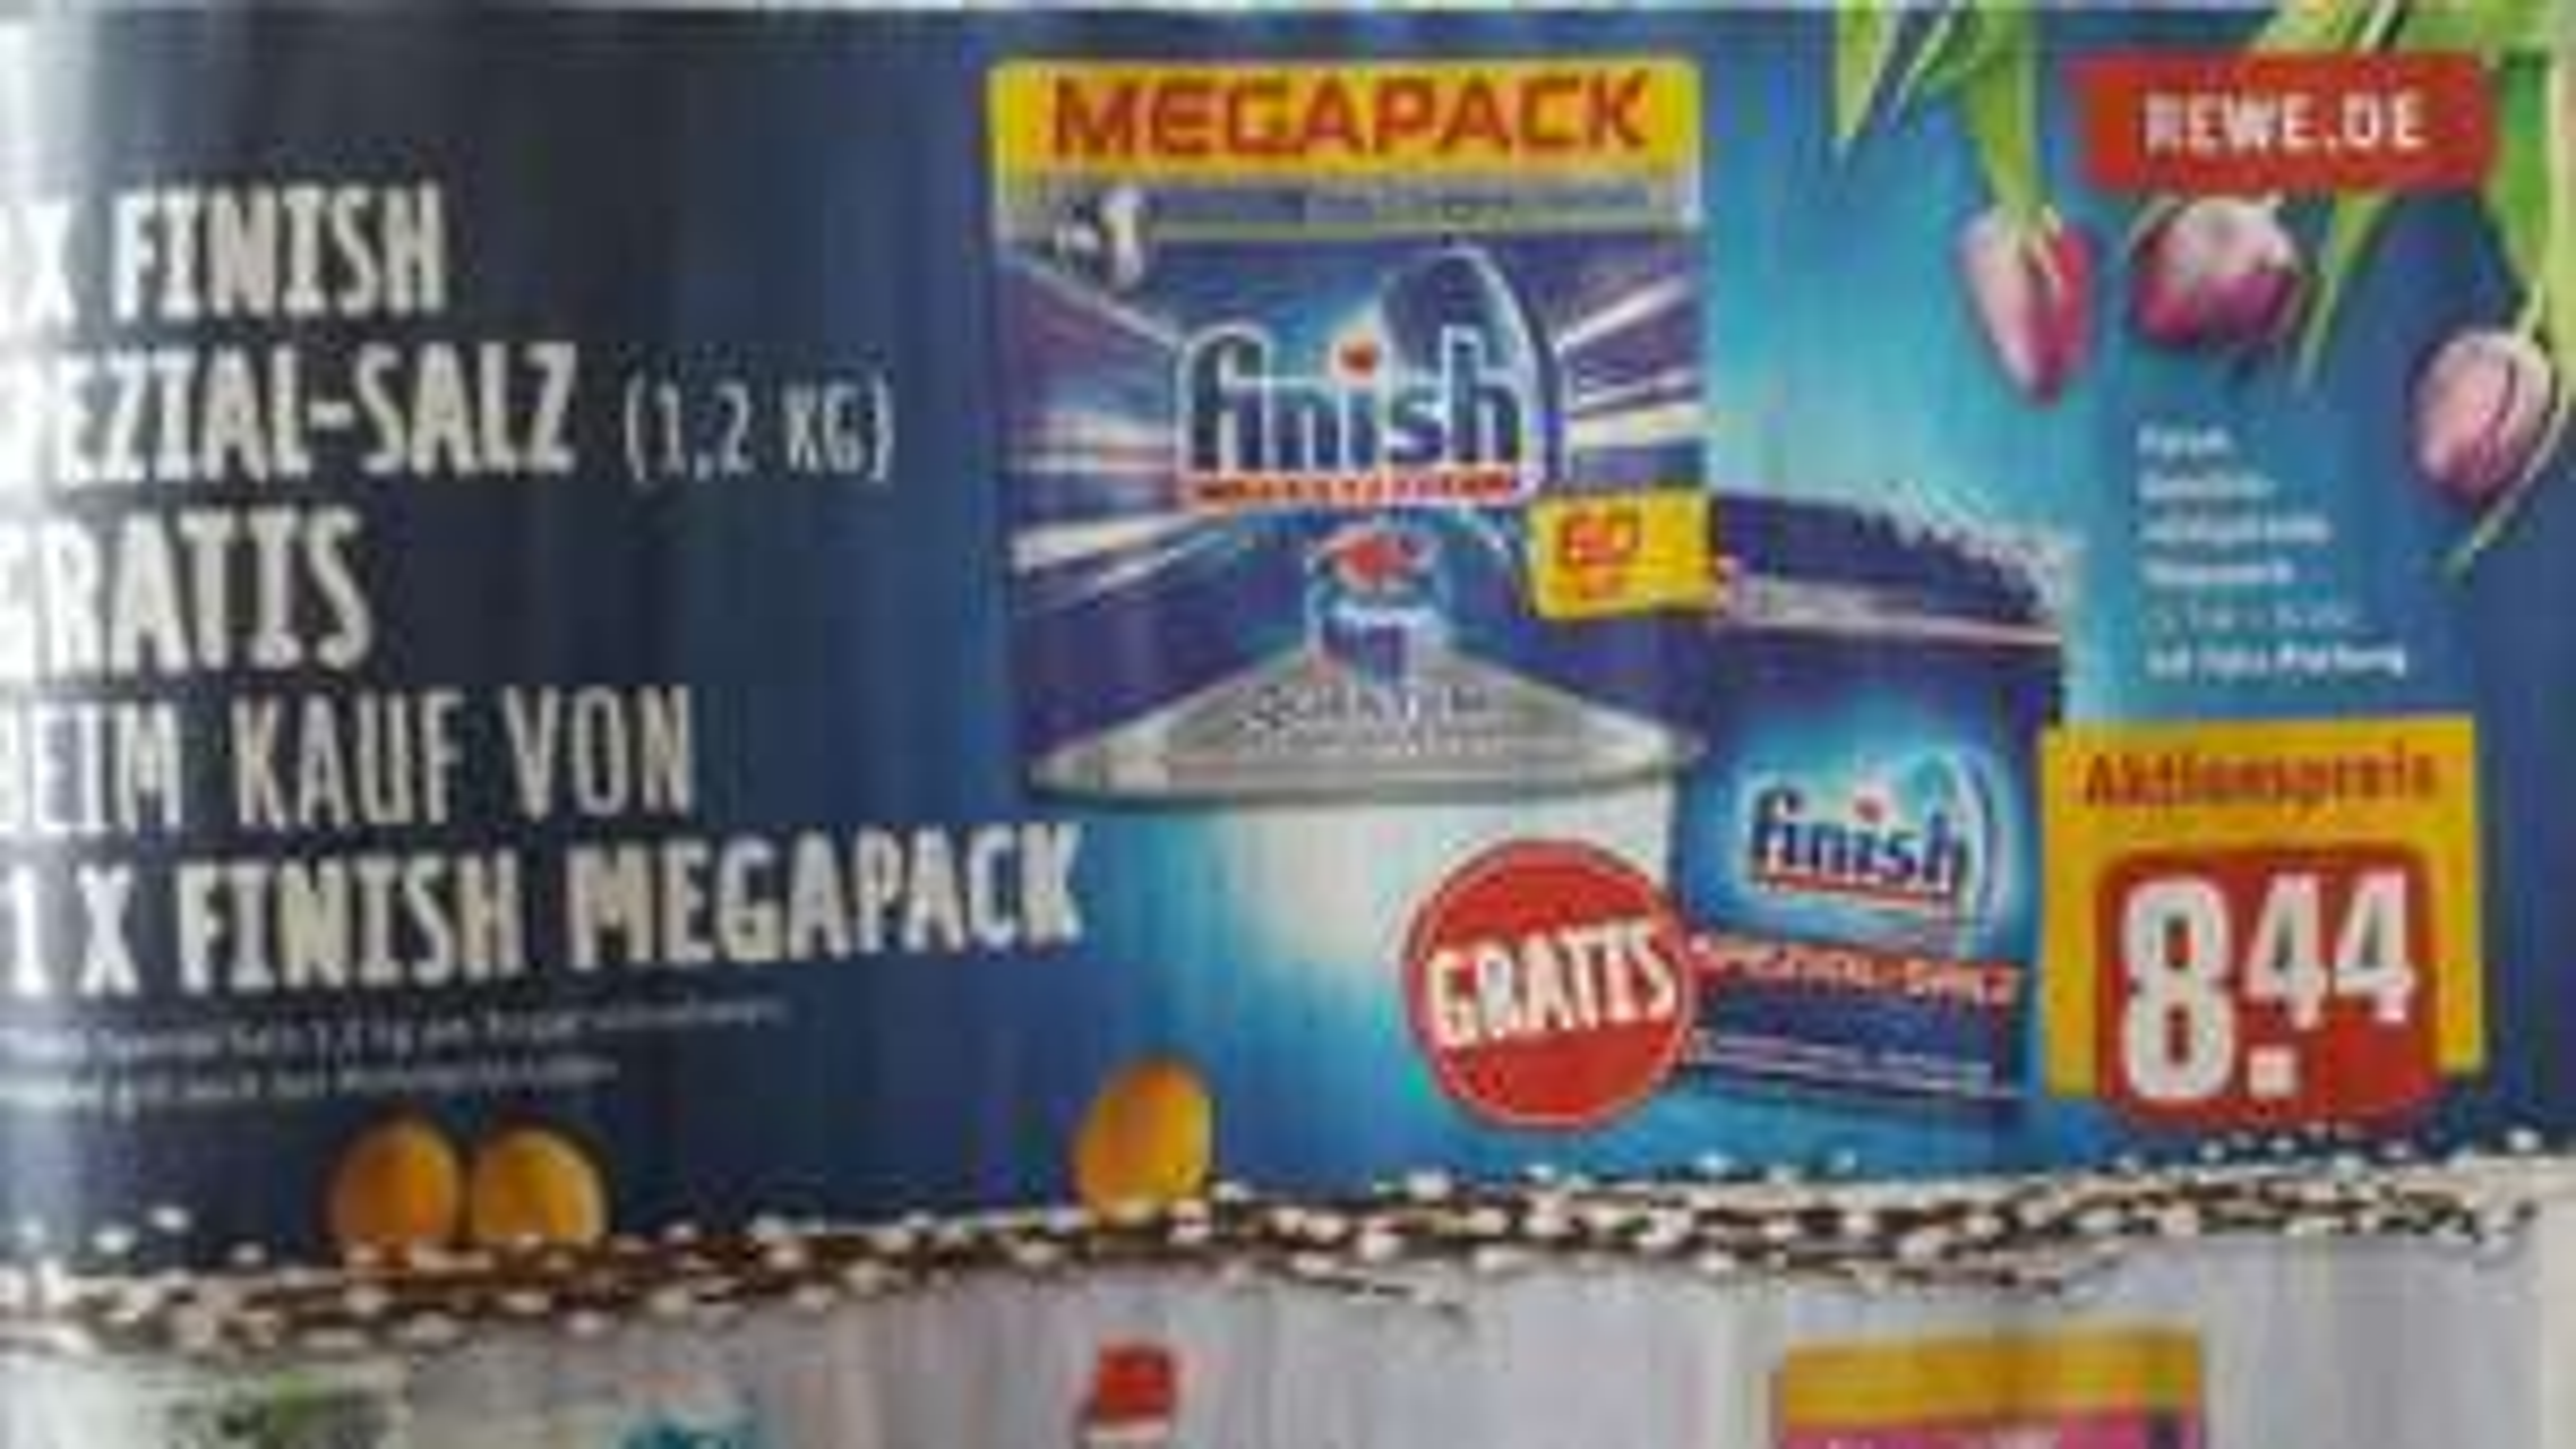 [Lokal / REWE] finish Powerball Geschirrreinigertabs Quantum (60 Stk.) Megapack + Gratis finish Spezial-Salz (1.2 kg)